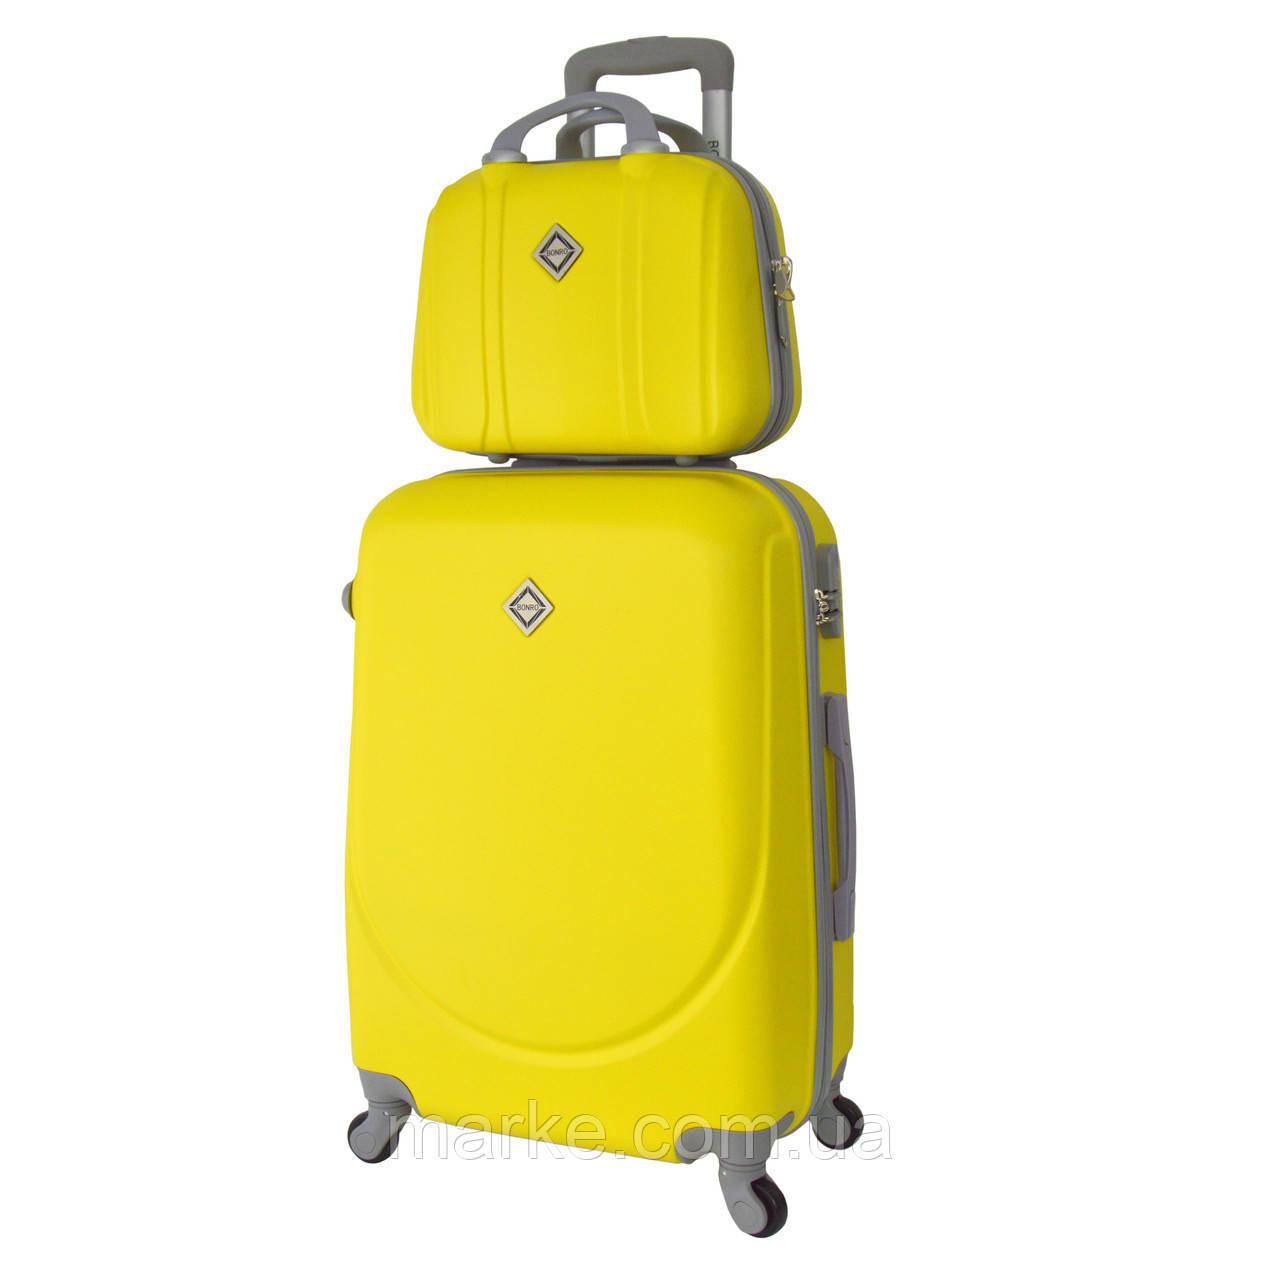 1166cd4dd39f Комплект чемодан + кейс Bonro Smile (средний) желтый  продажа, цена ...